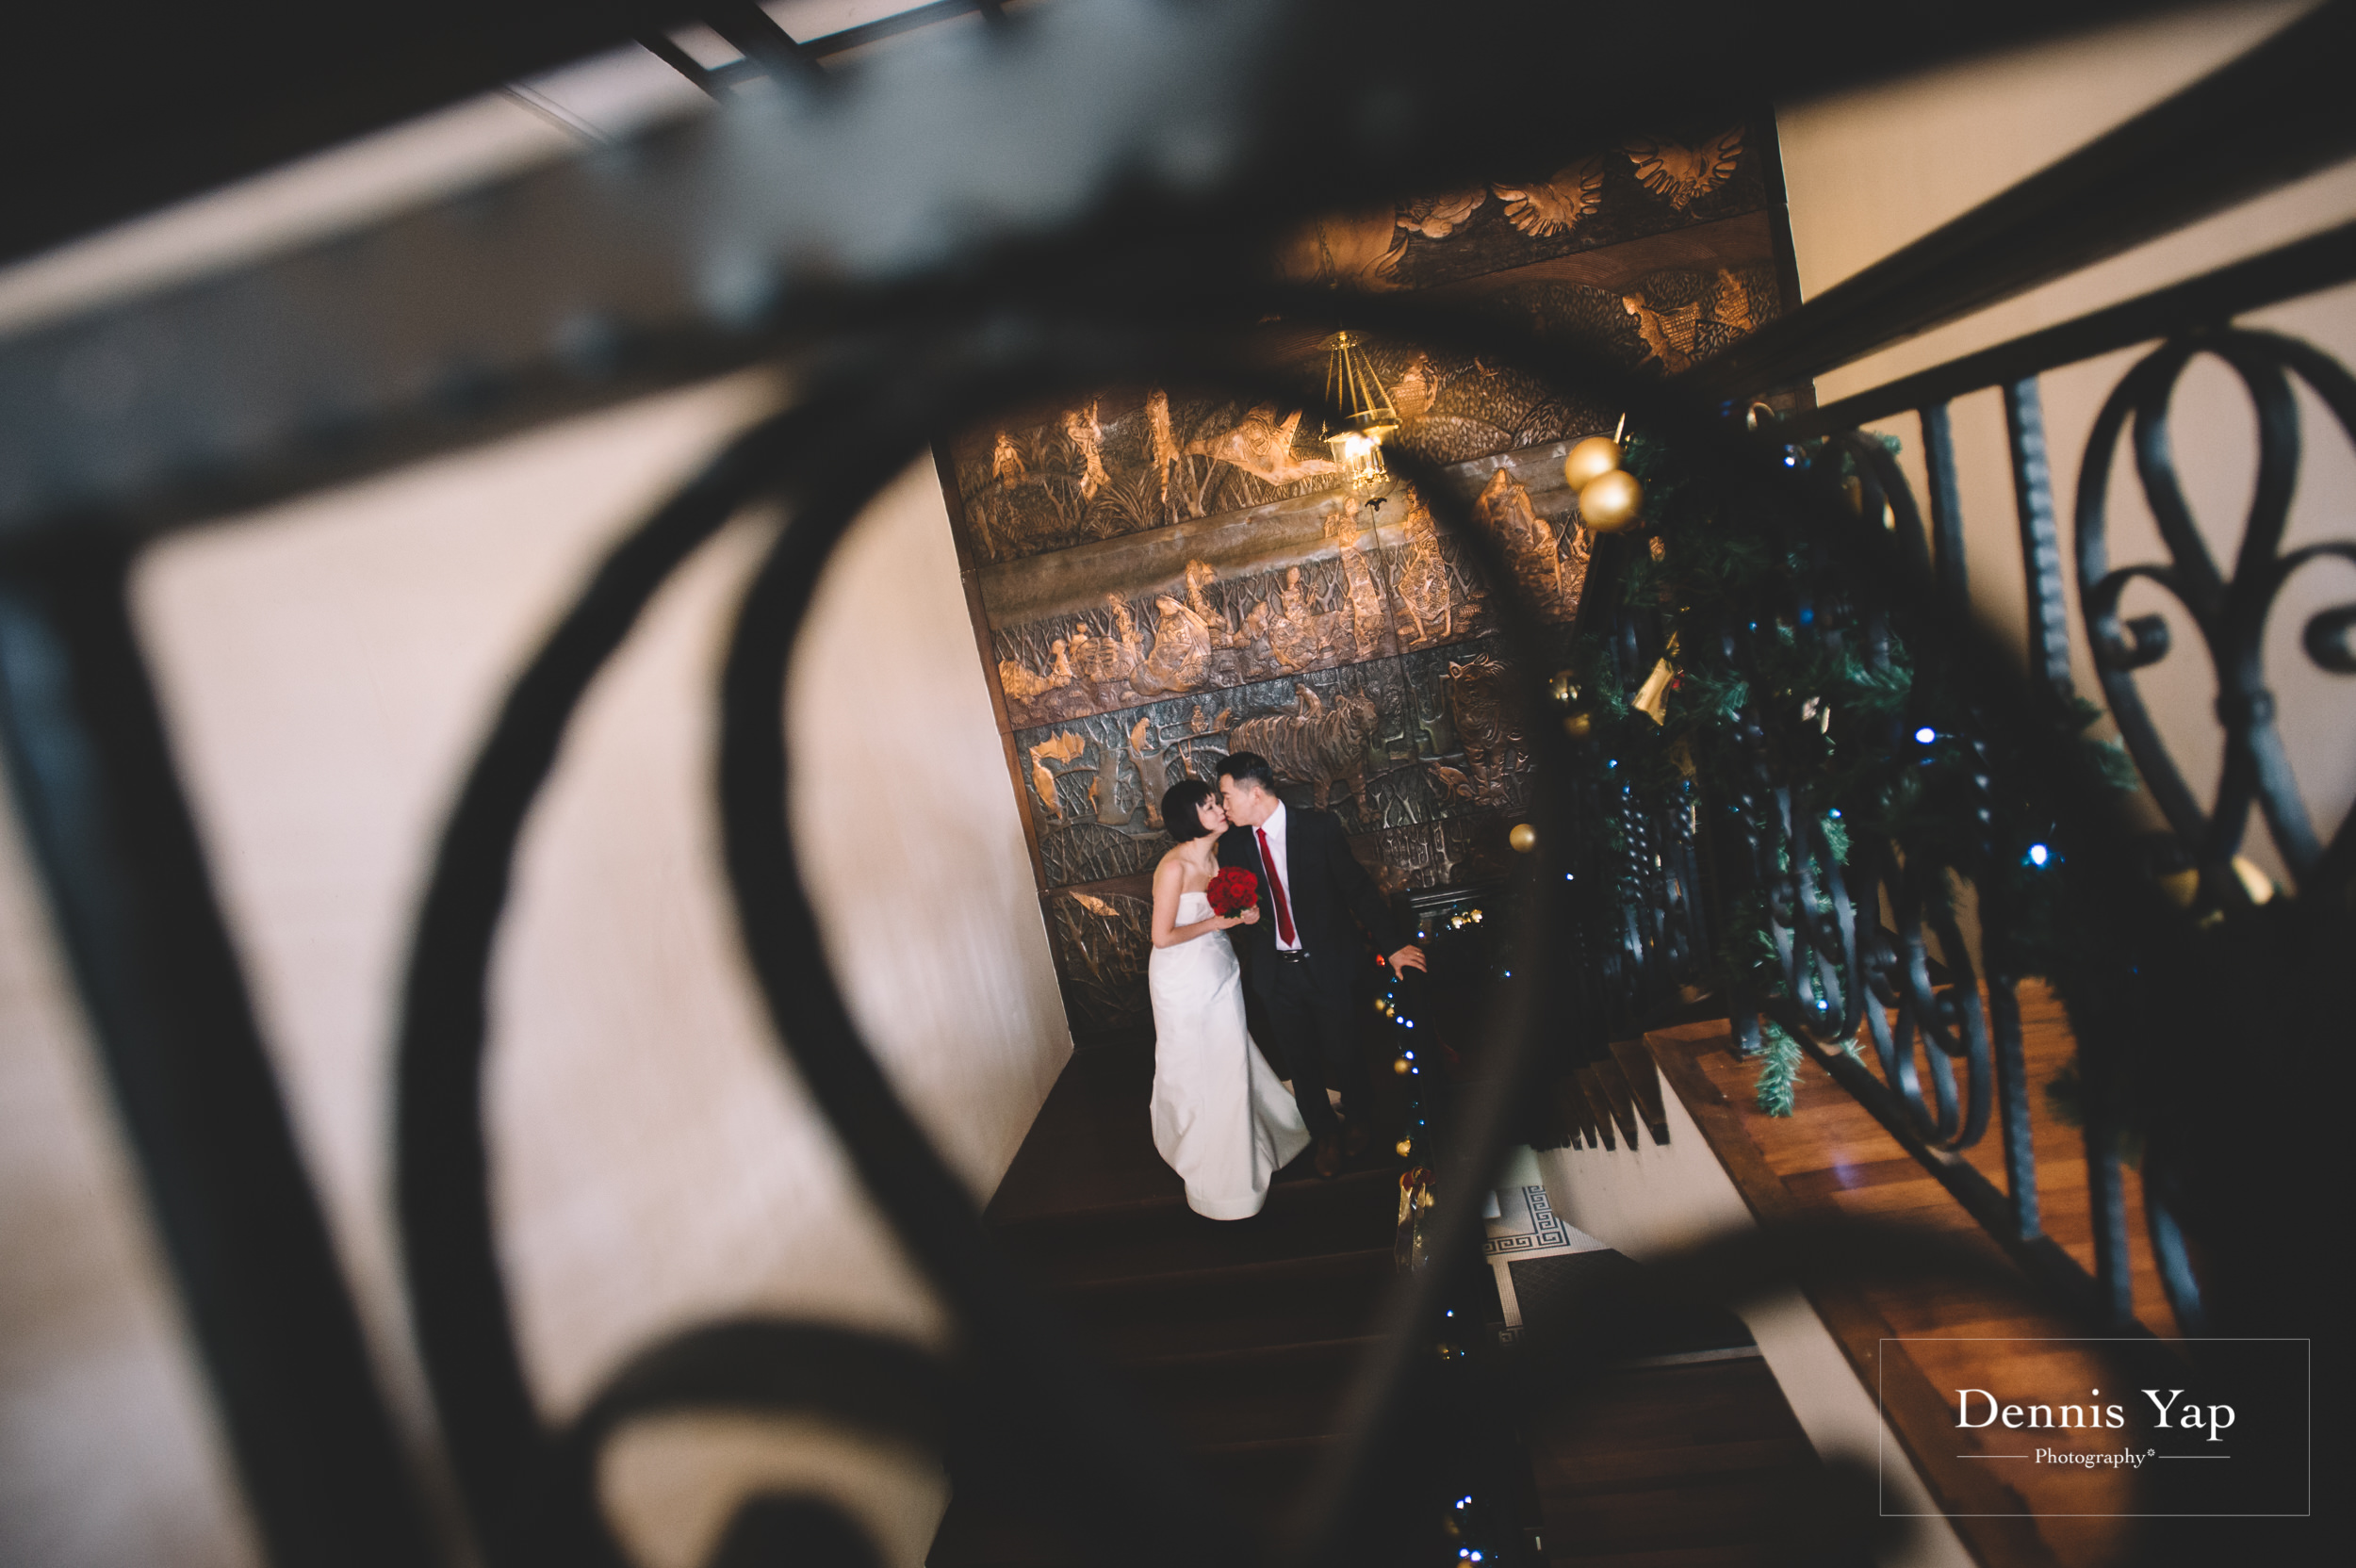 boon weng cyndy love family values pre wedding cameron highlands smoke house dennis yap photography-67.jpg